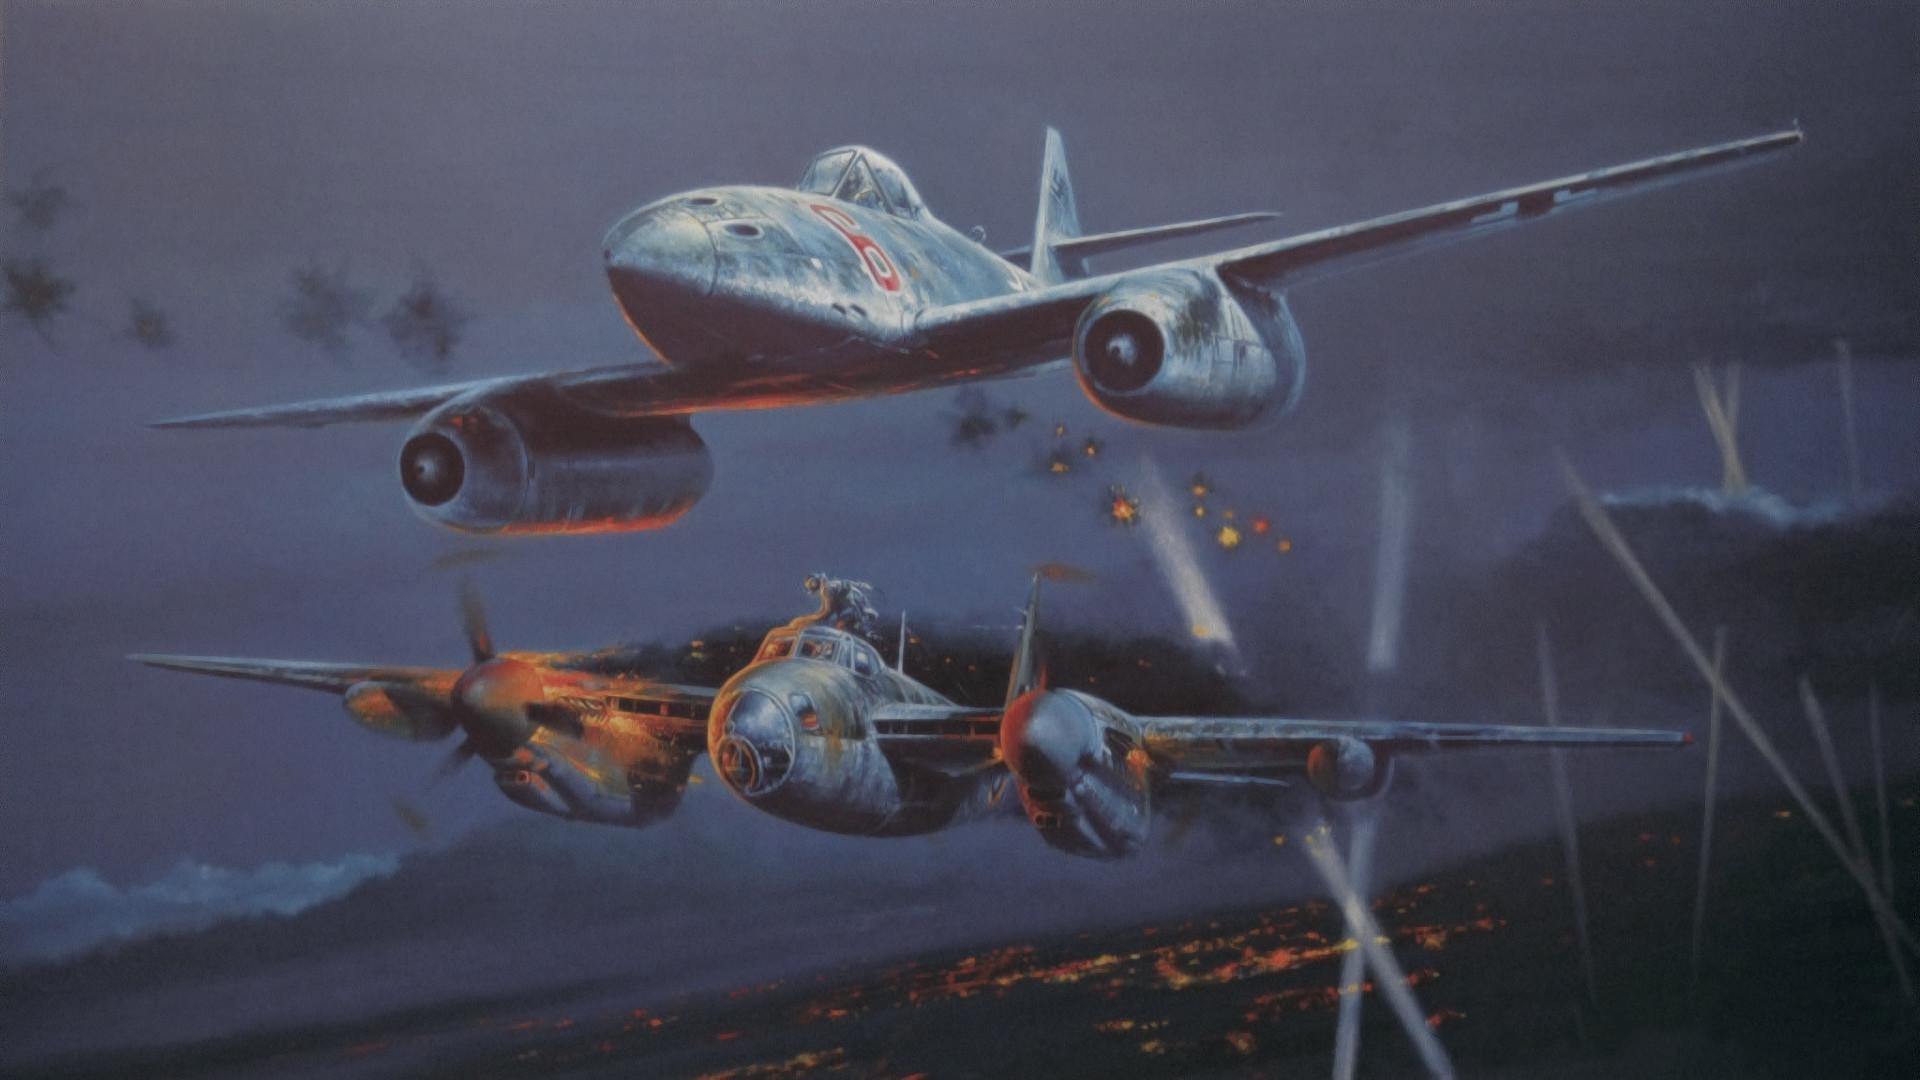 De Havilland Mosquito Night Fighter attacked by Messerschmitt Me 262